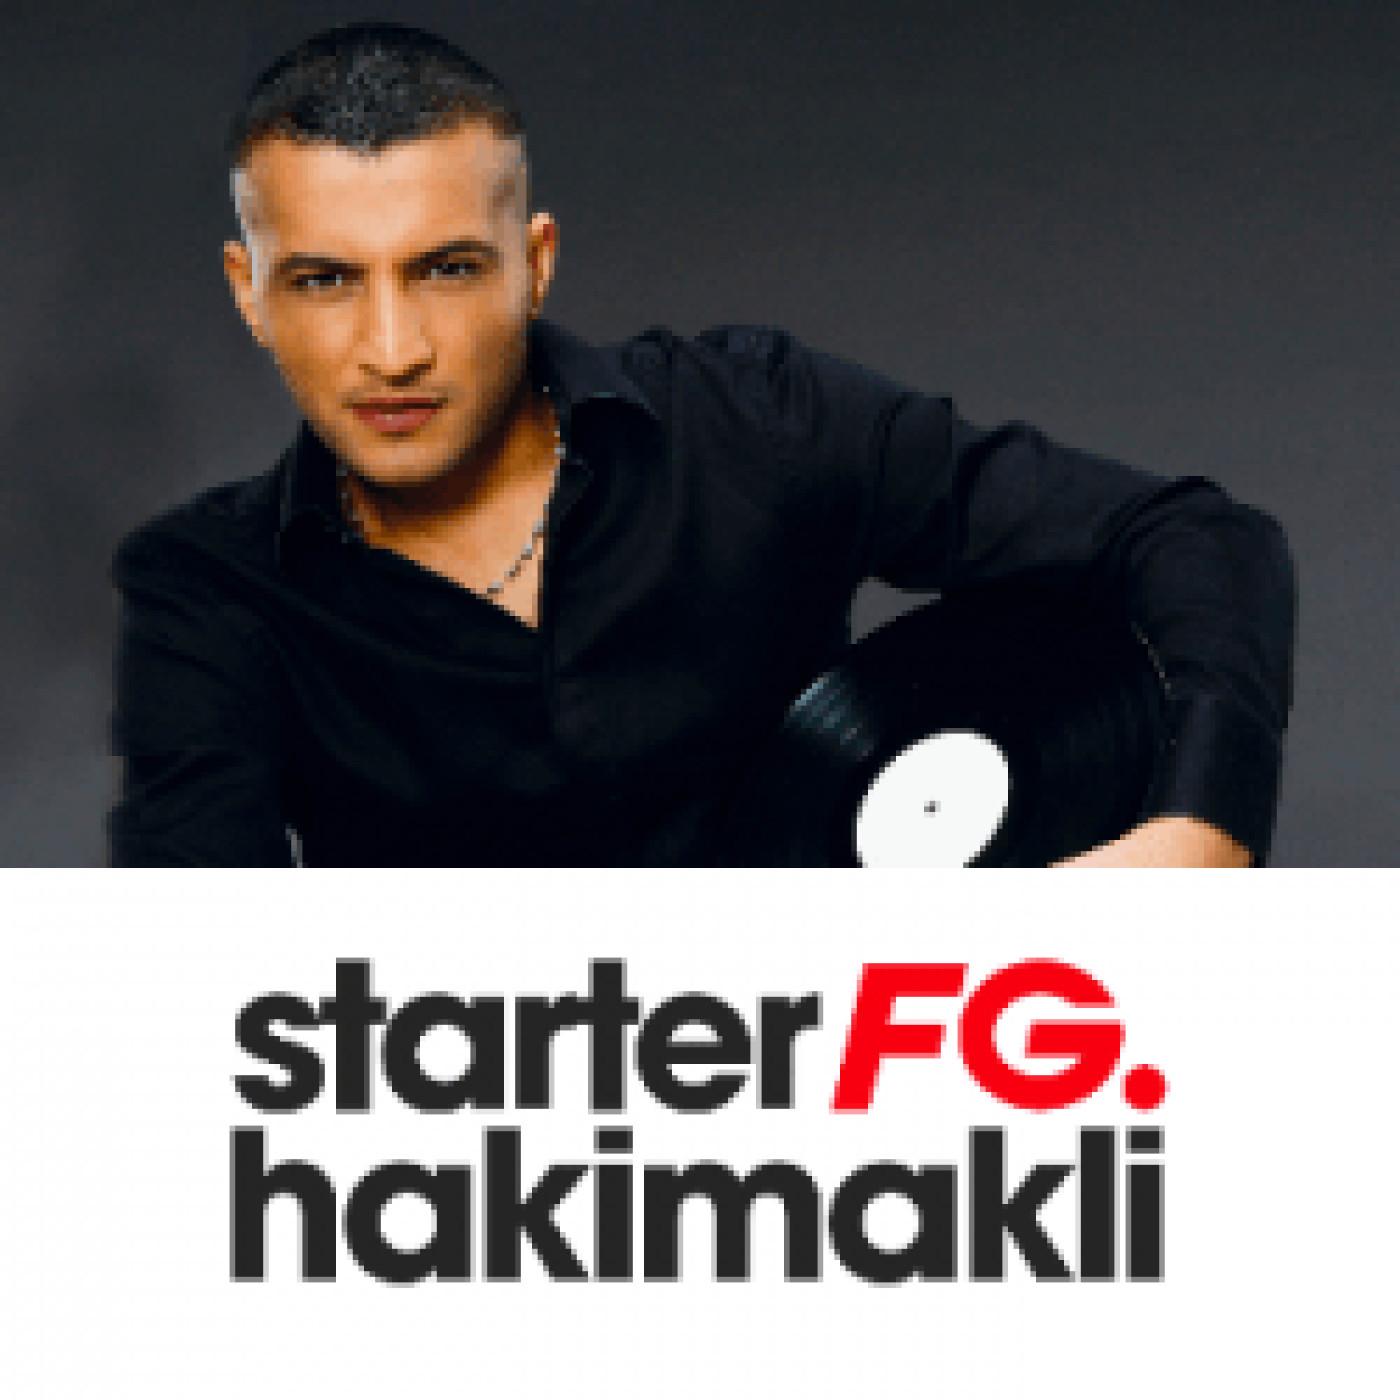 STARTER FG BY HAKIMAKLI MARDI 1 SEPTEMBRE 2020